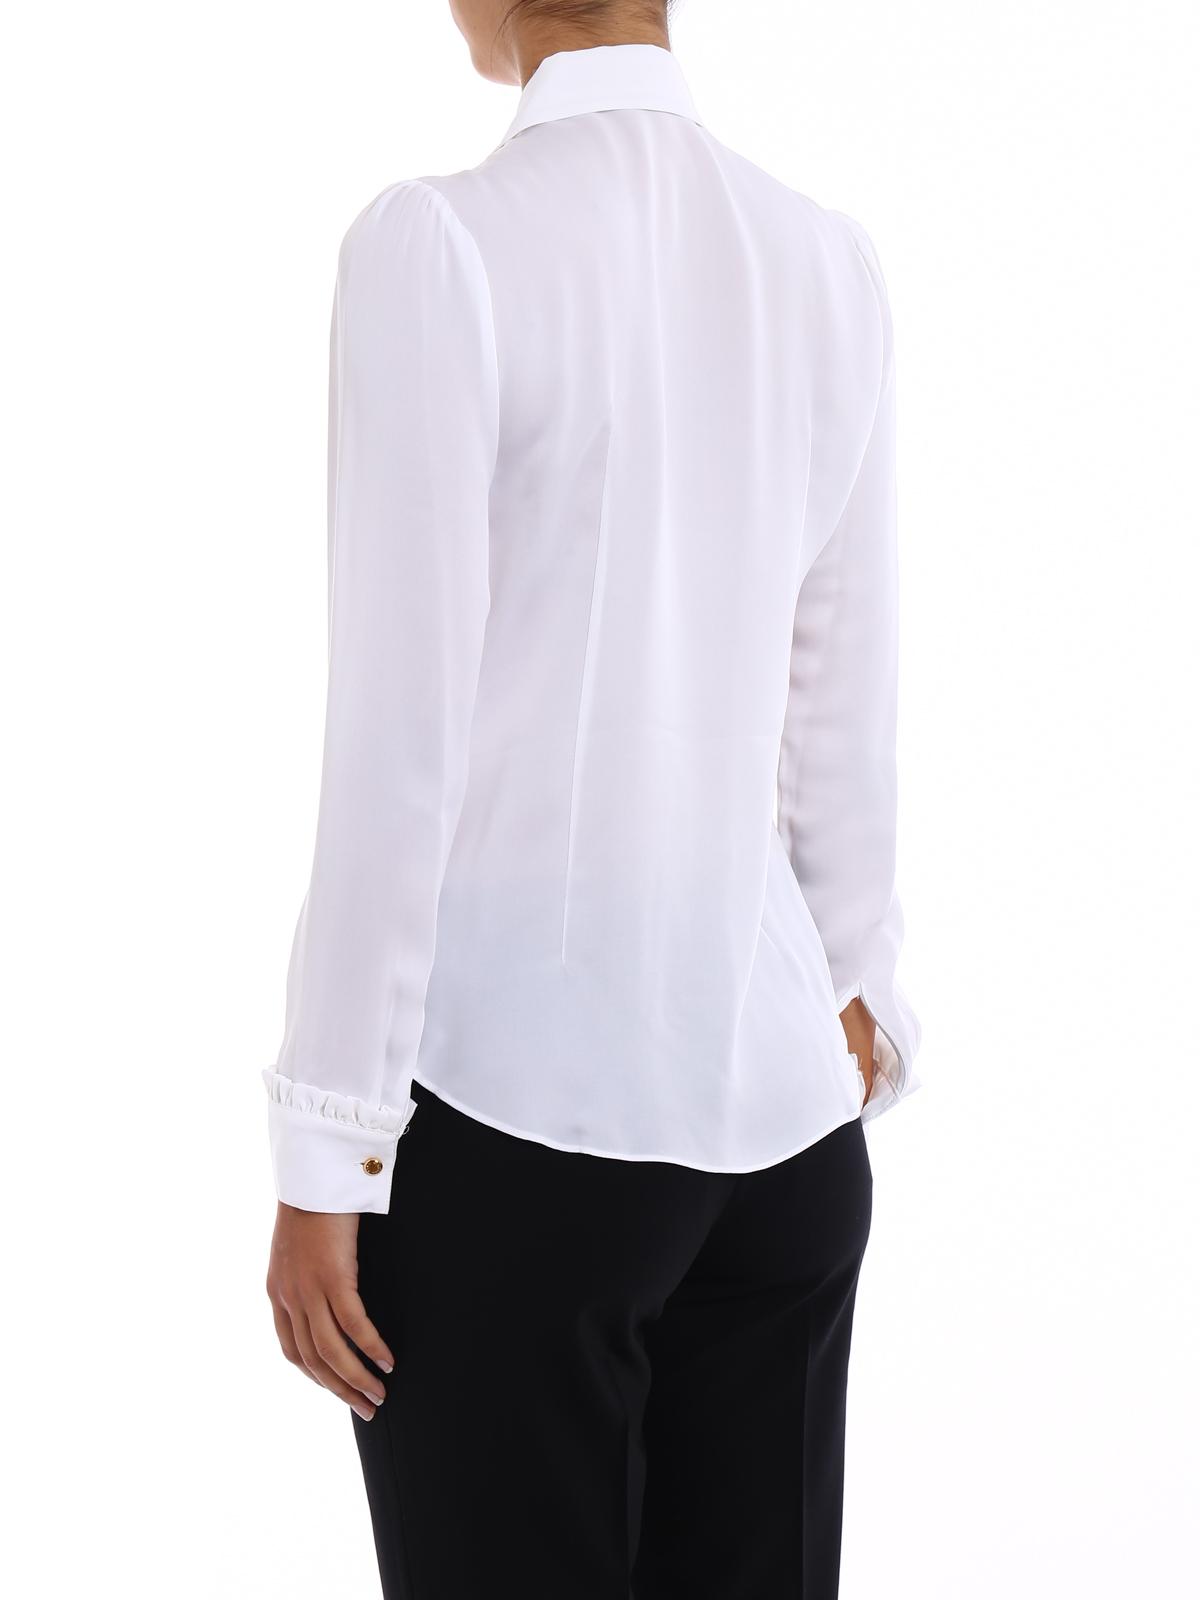 390a3414df406b Michael Kors - Camicia in seta bianca con ruches - camicie ...